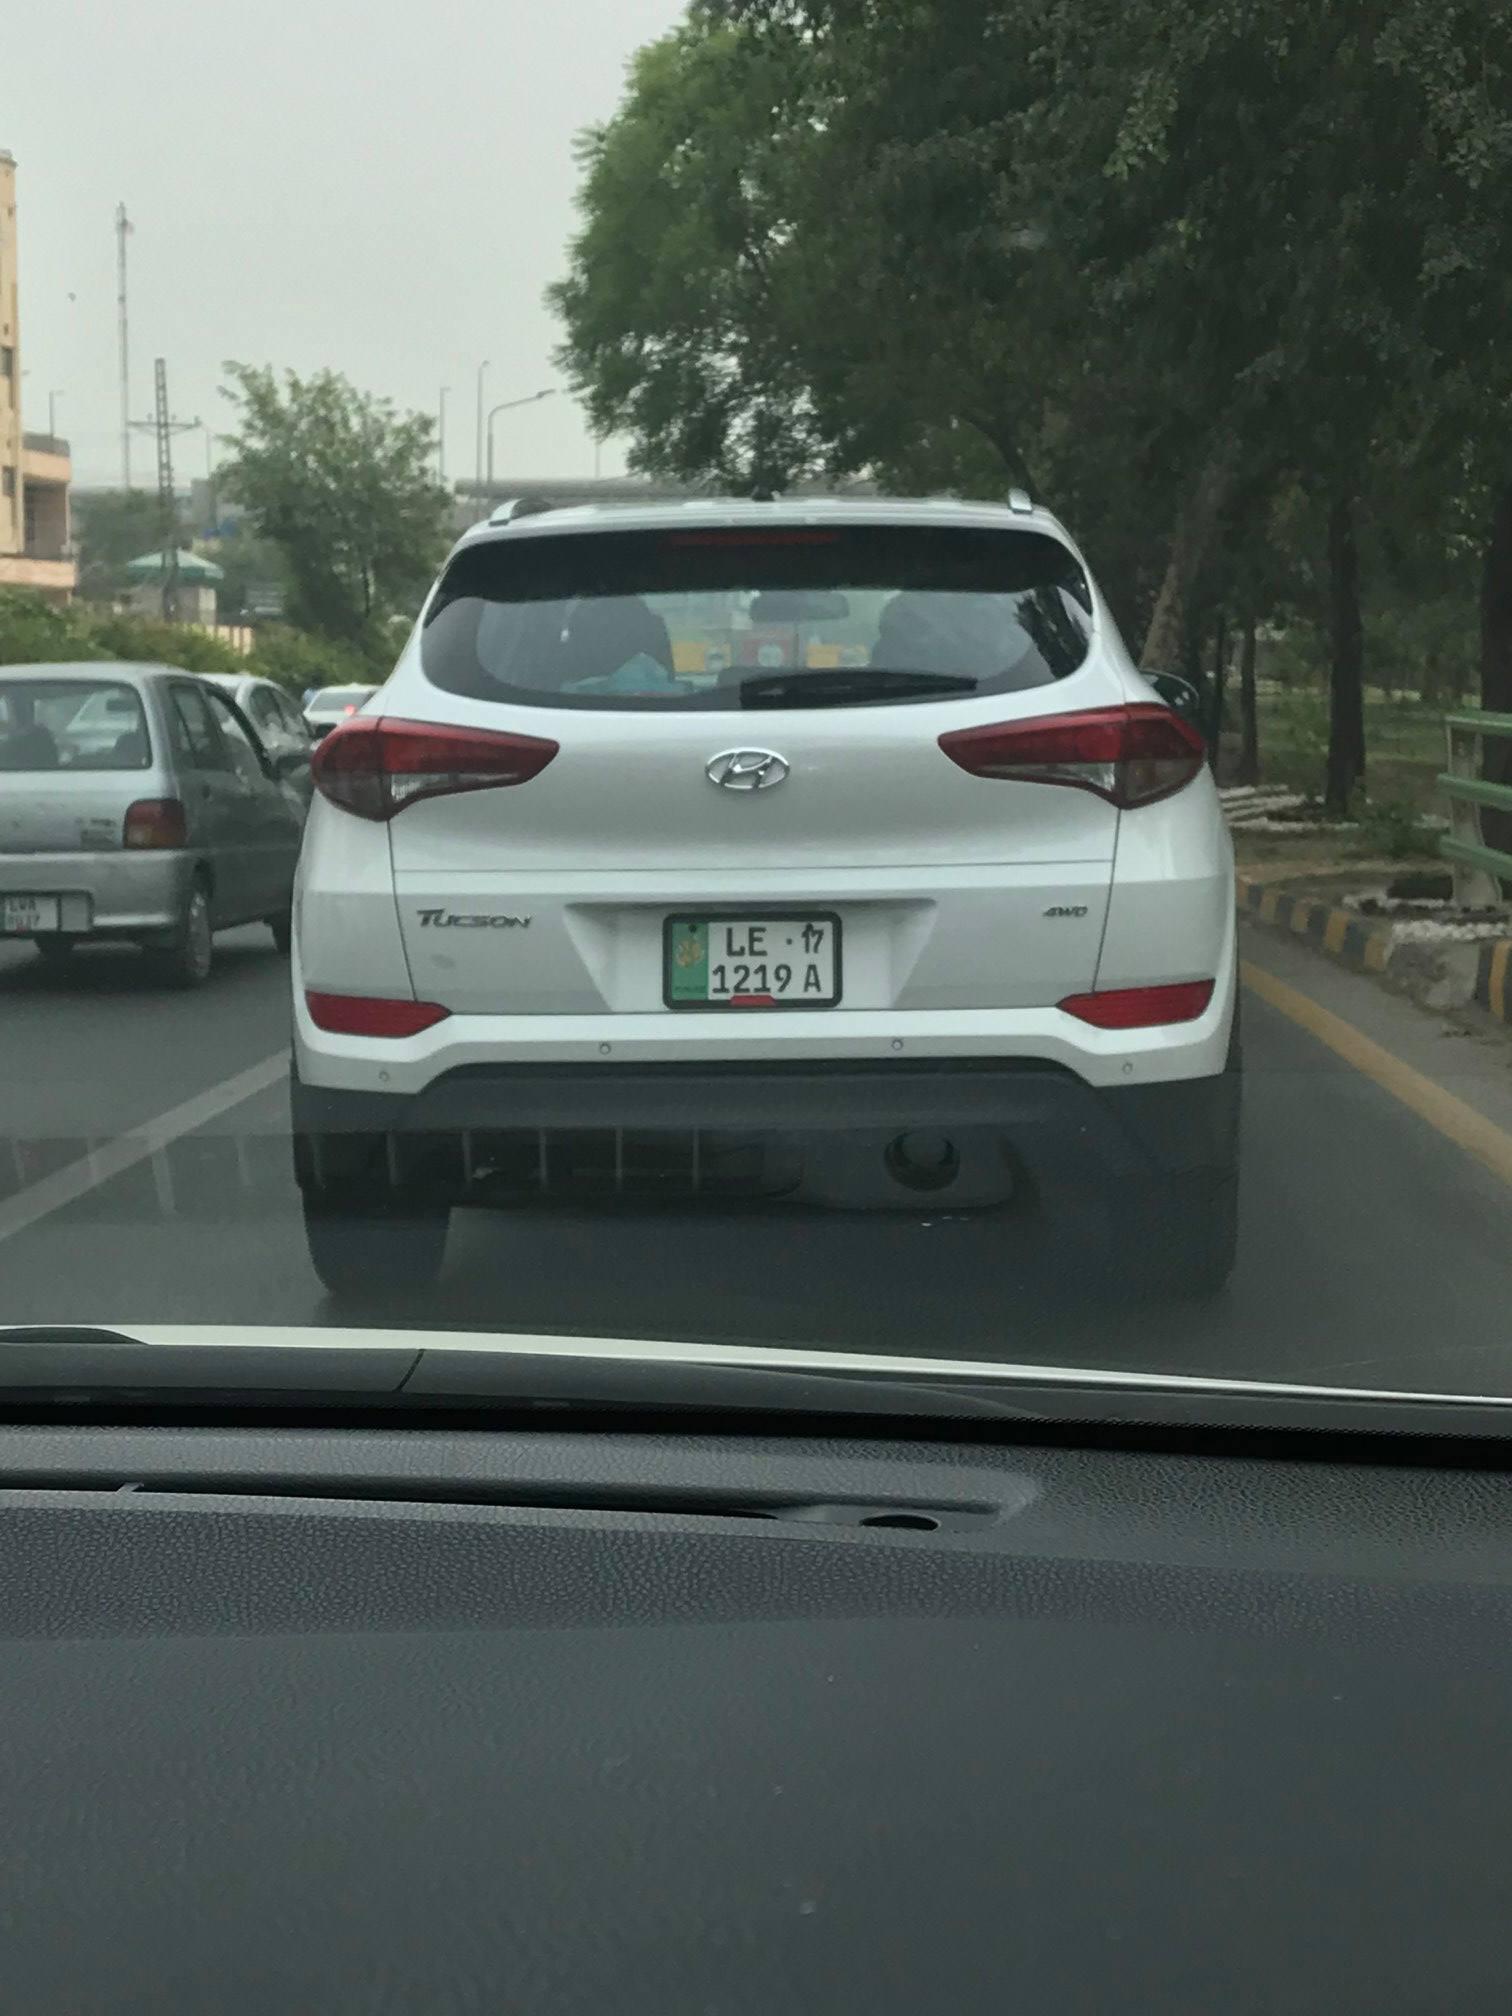 Hyundai Tucson Lahore Spotting (1)